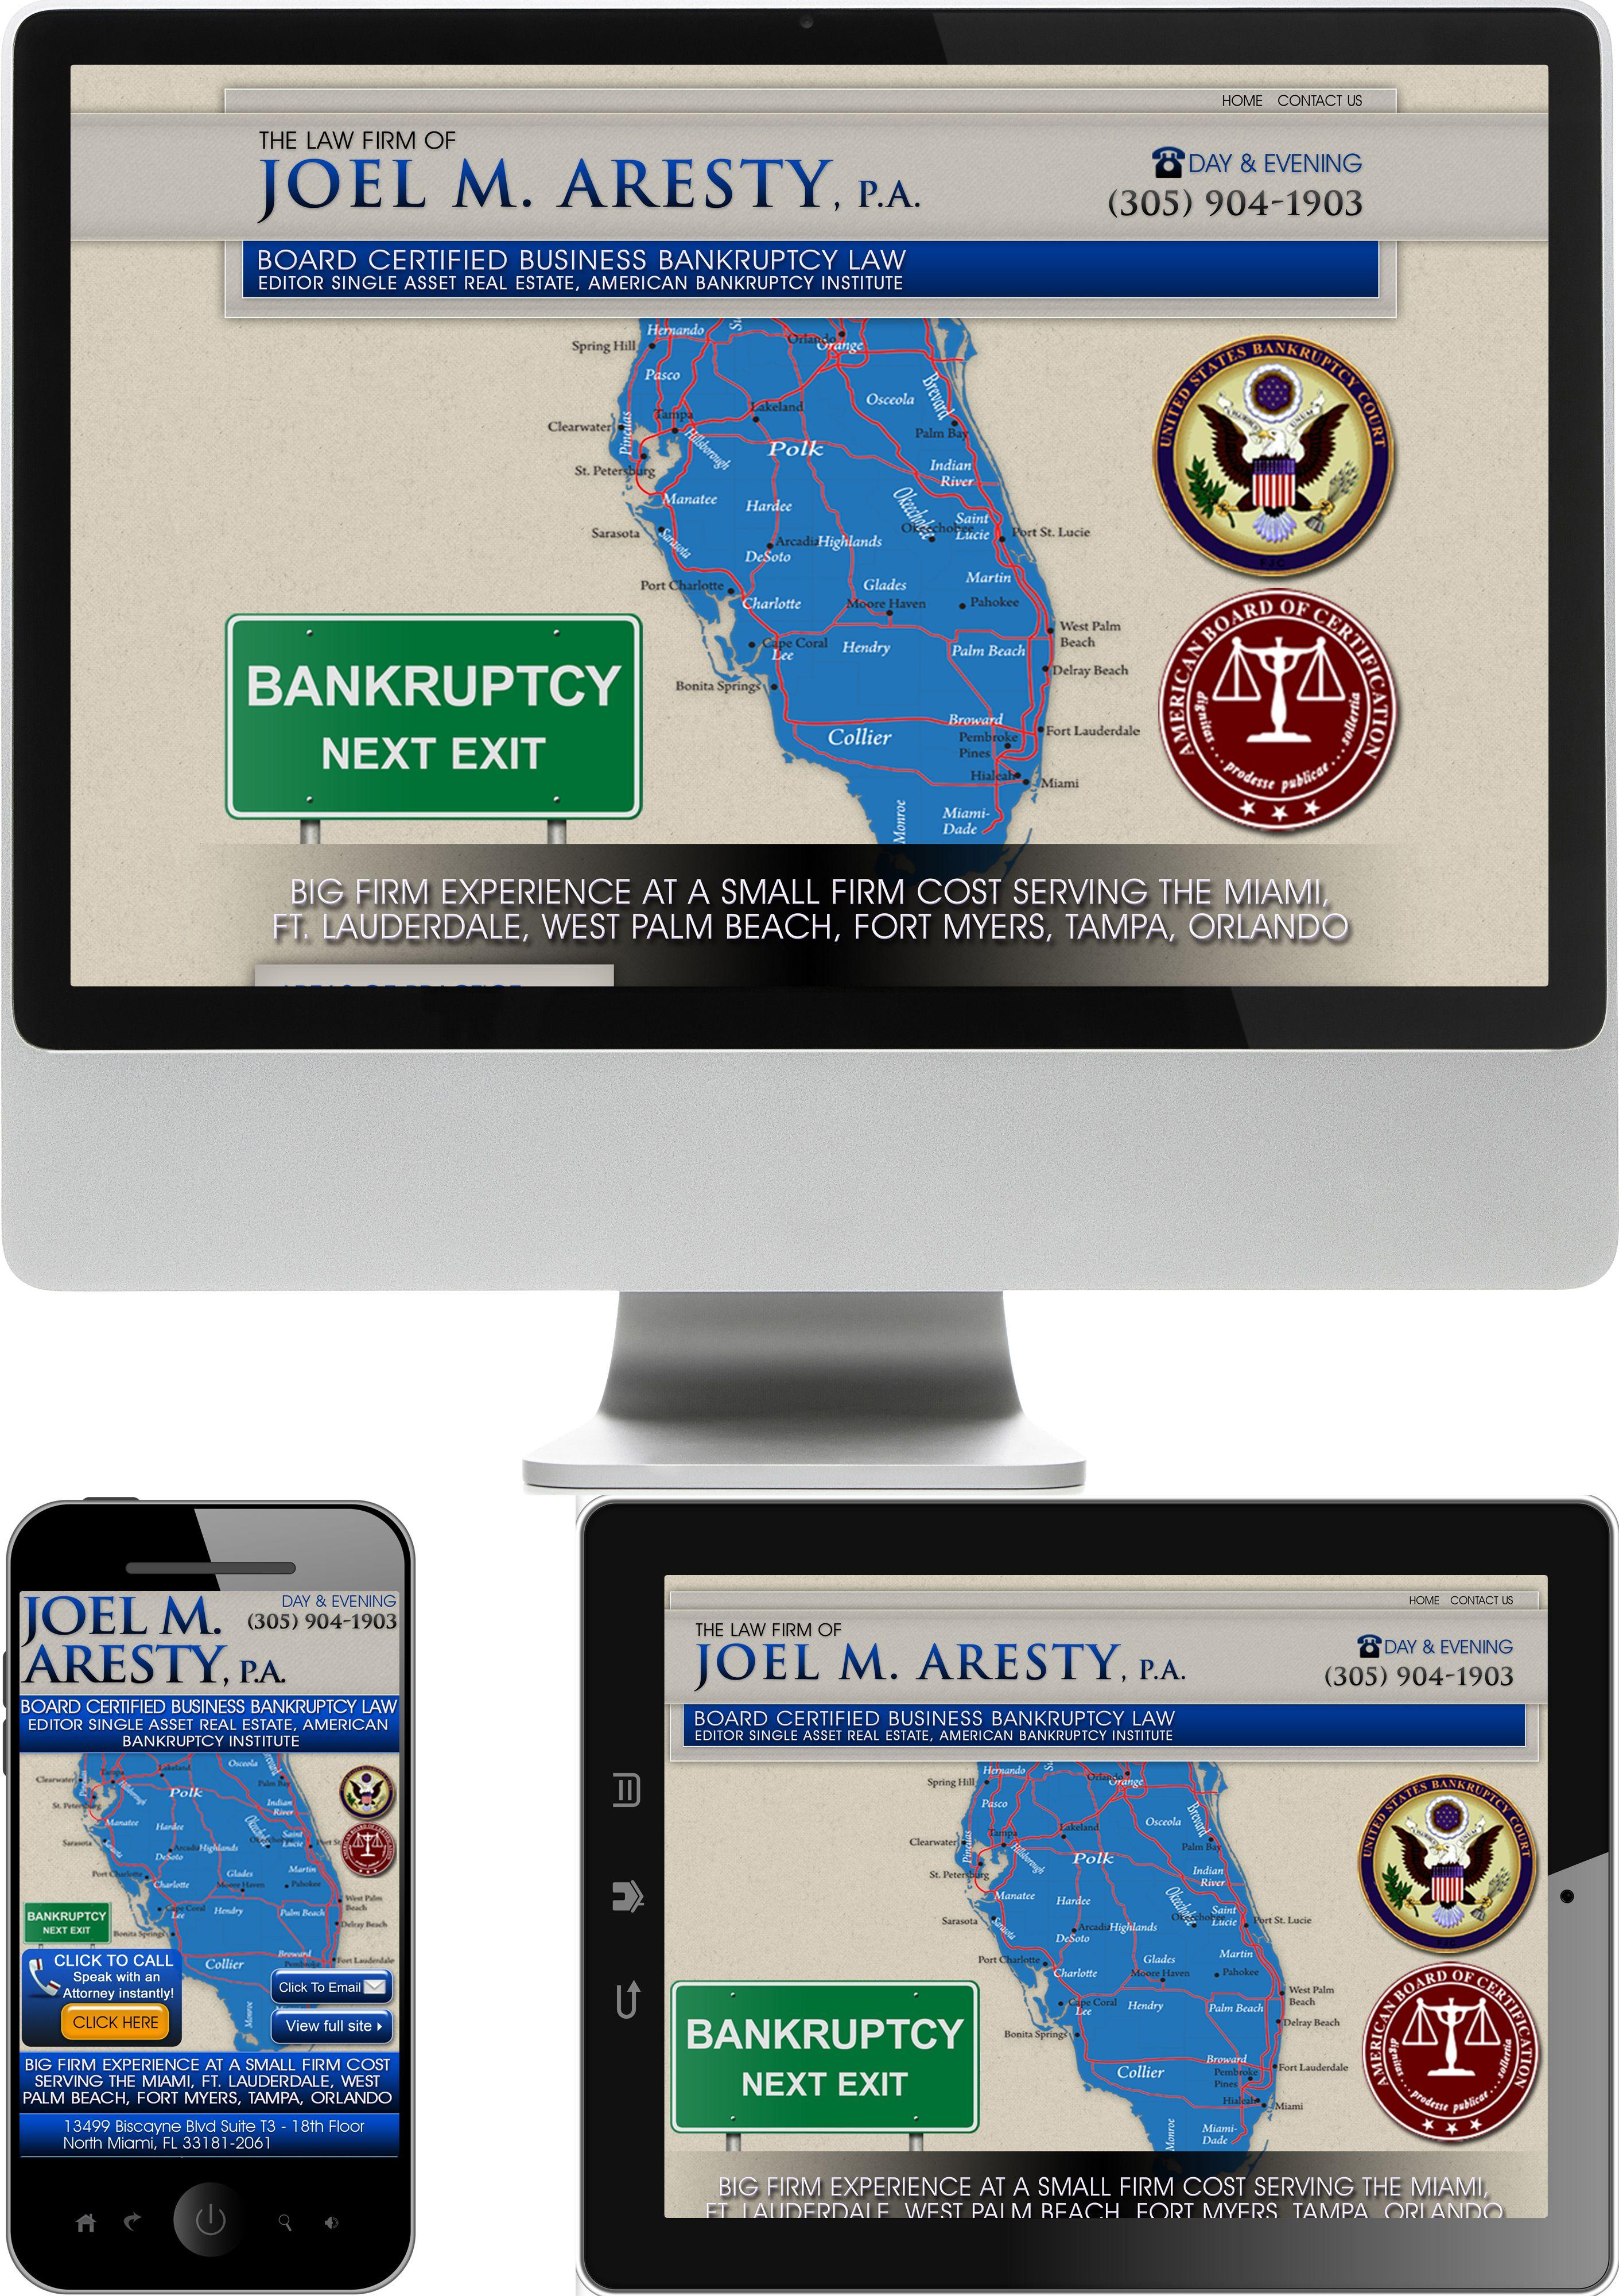 Florida Bankruptcy Attorney Joel Aresty Website Design - Check out our newest portfolio designs at http://firstpageattorney.com/web-design-portfolio/